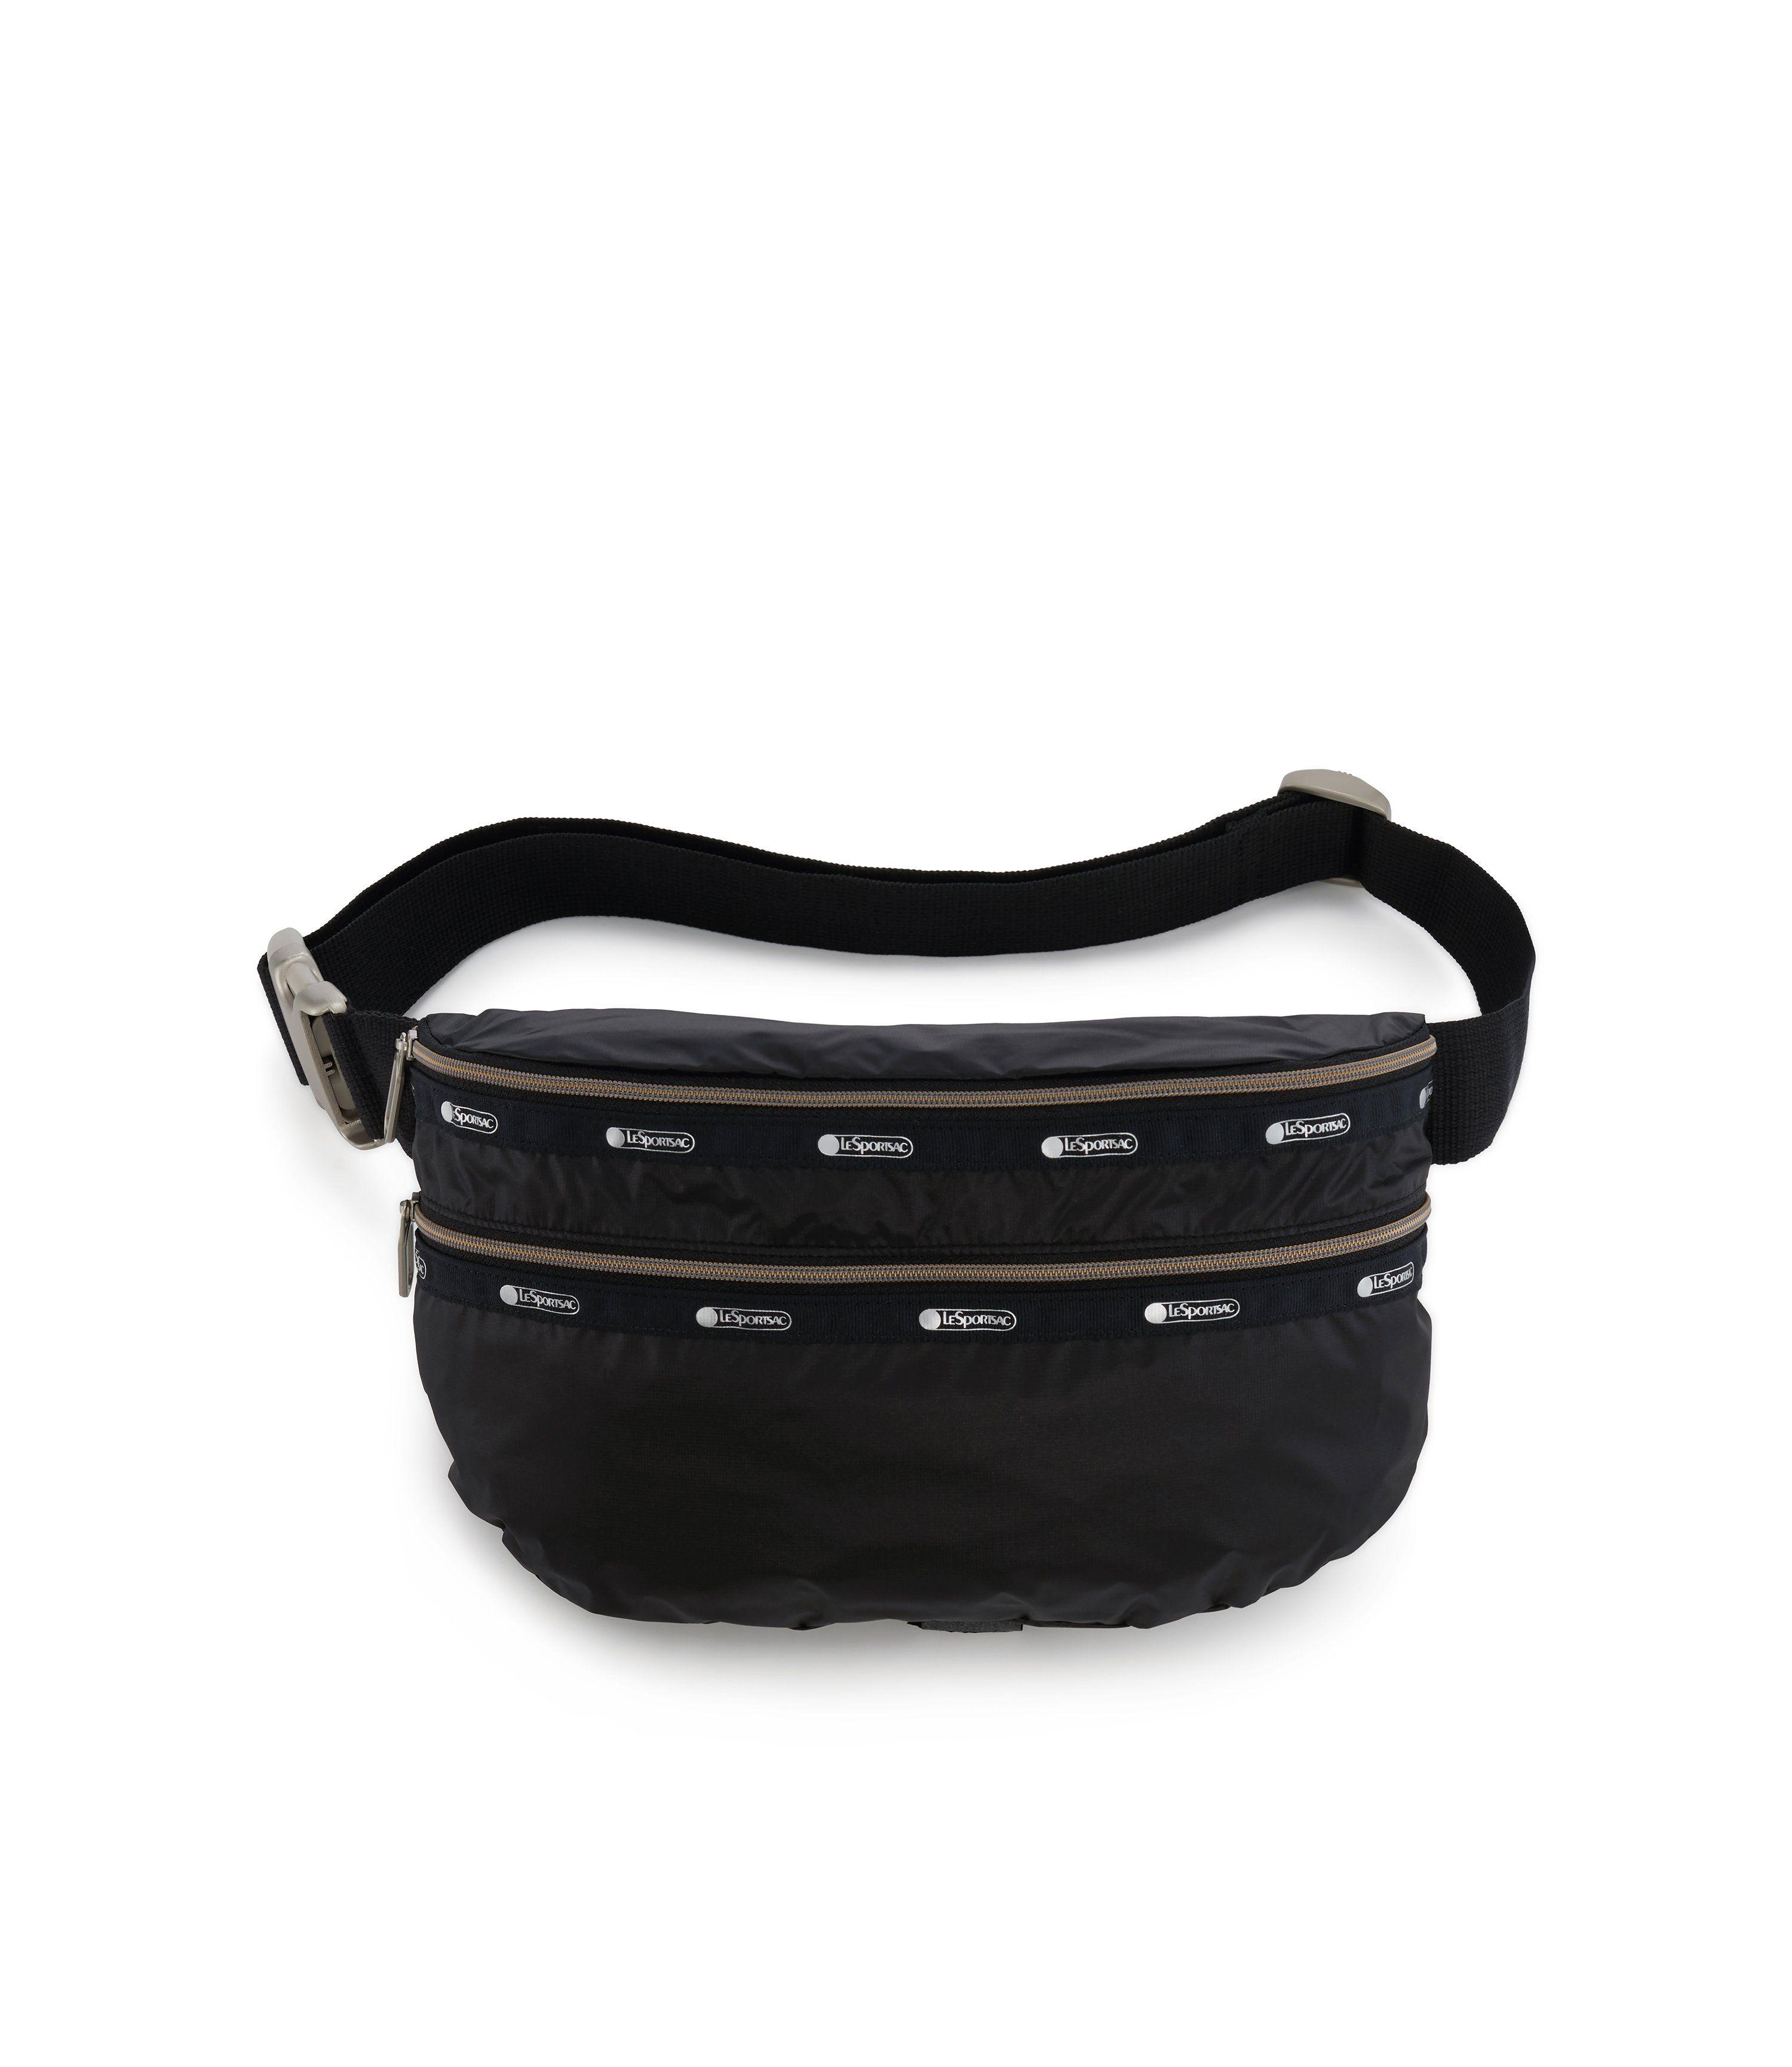 f96727a10cb1ae Sporty Belt Bag   wntsss   Bags, Belt, Sporty